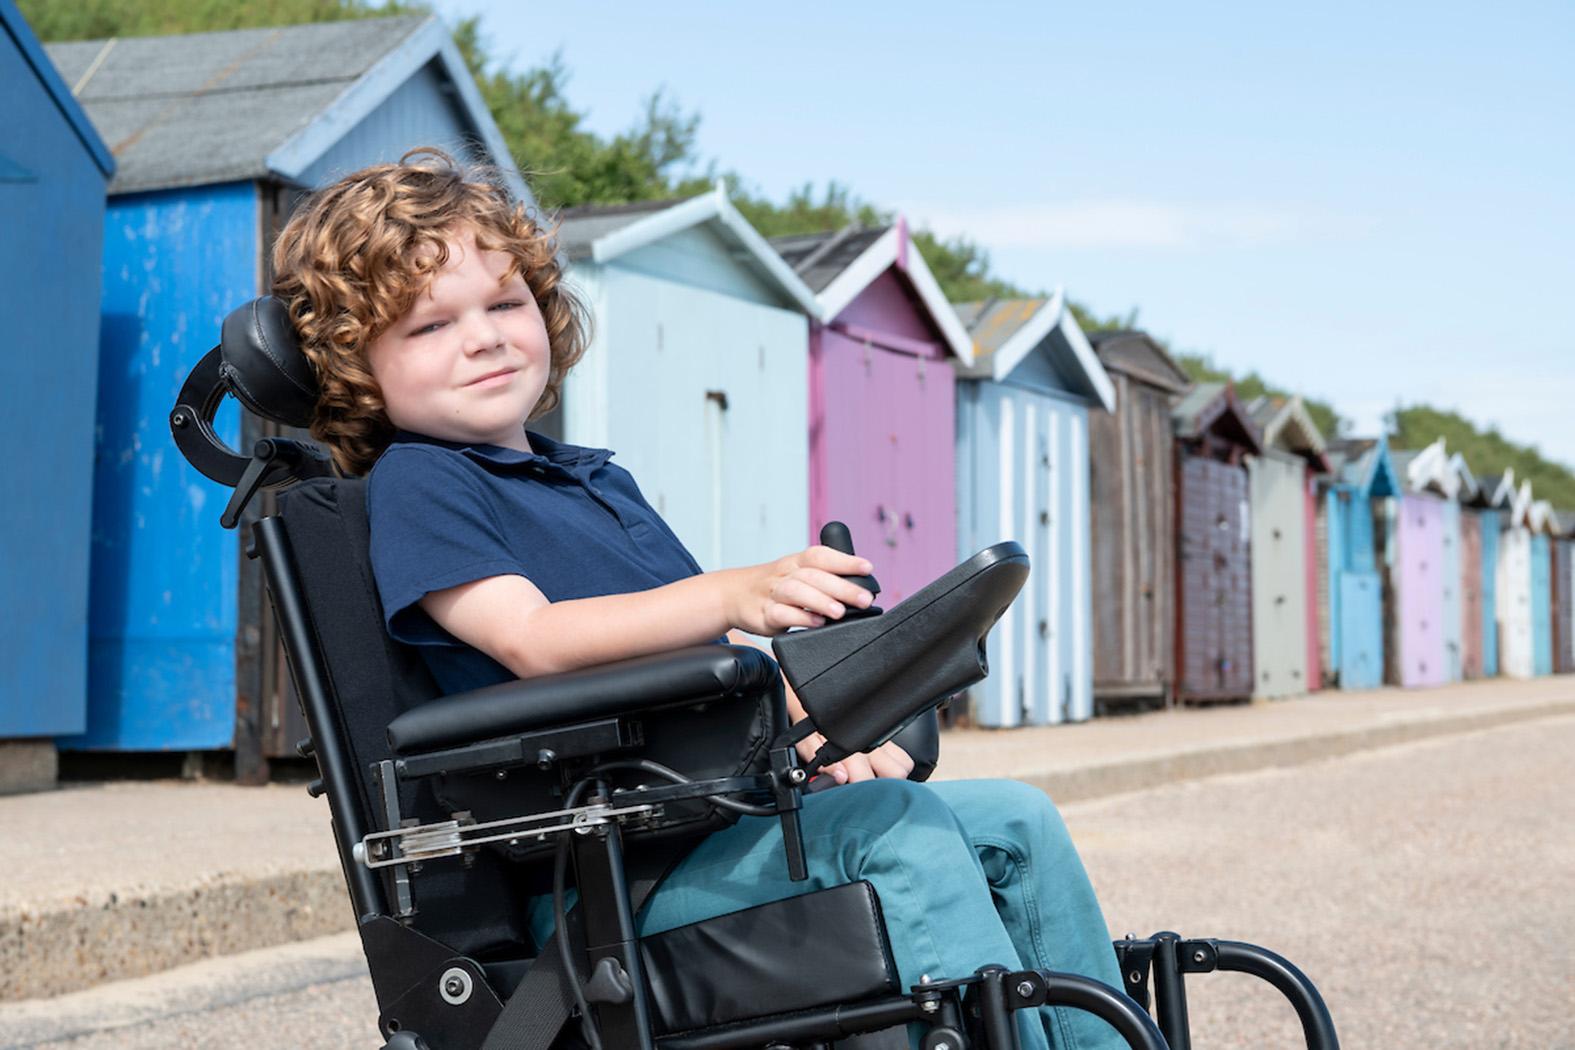 Stanley, Congenital Muscular Dystrophy,